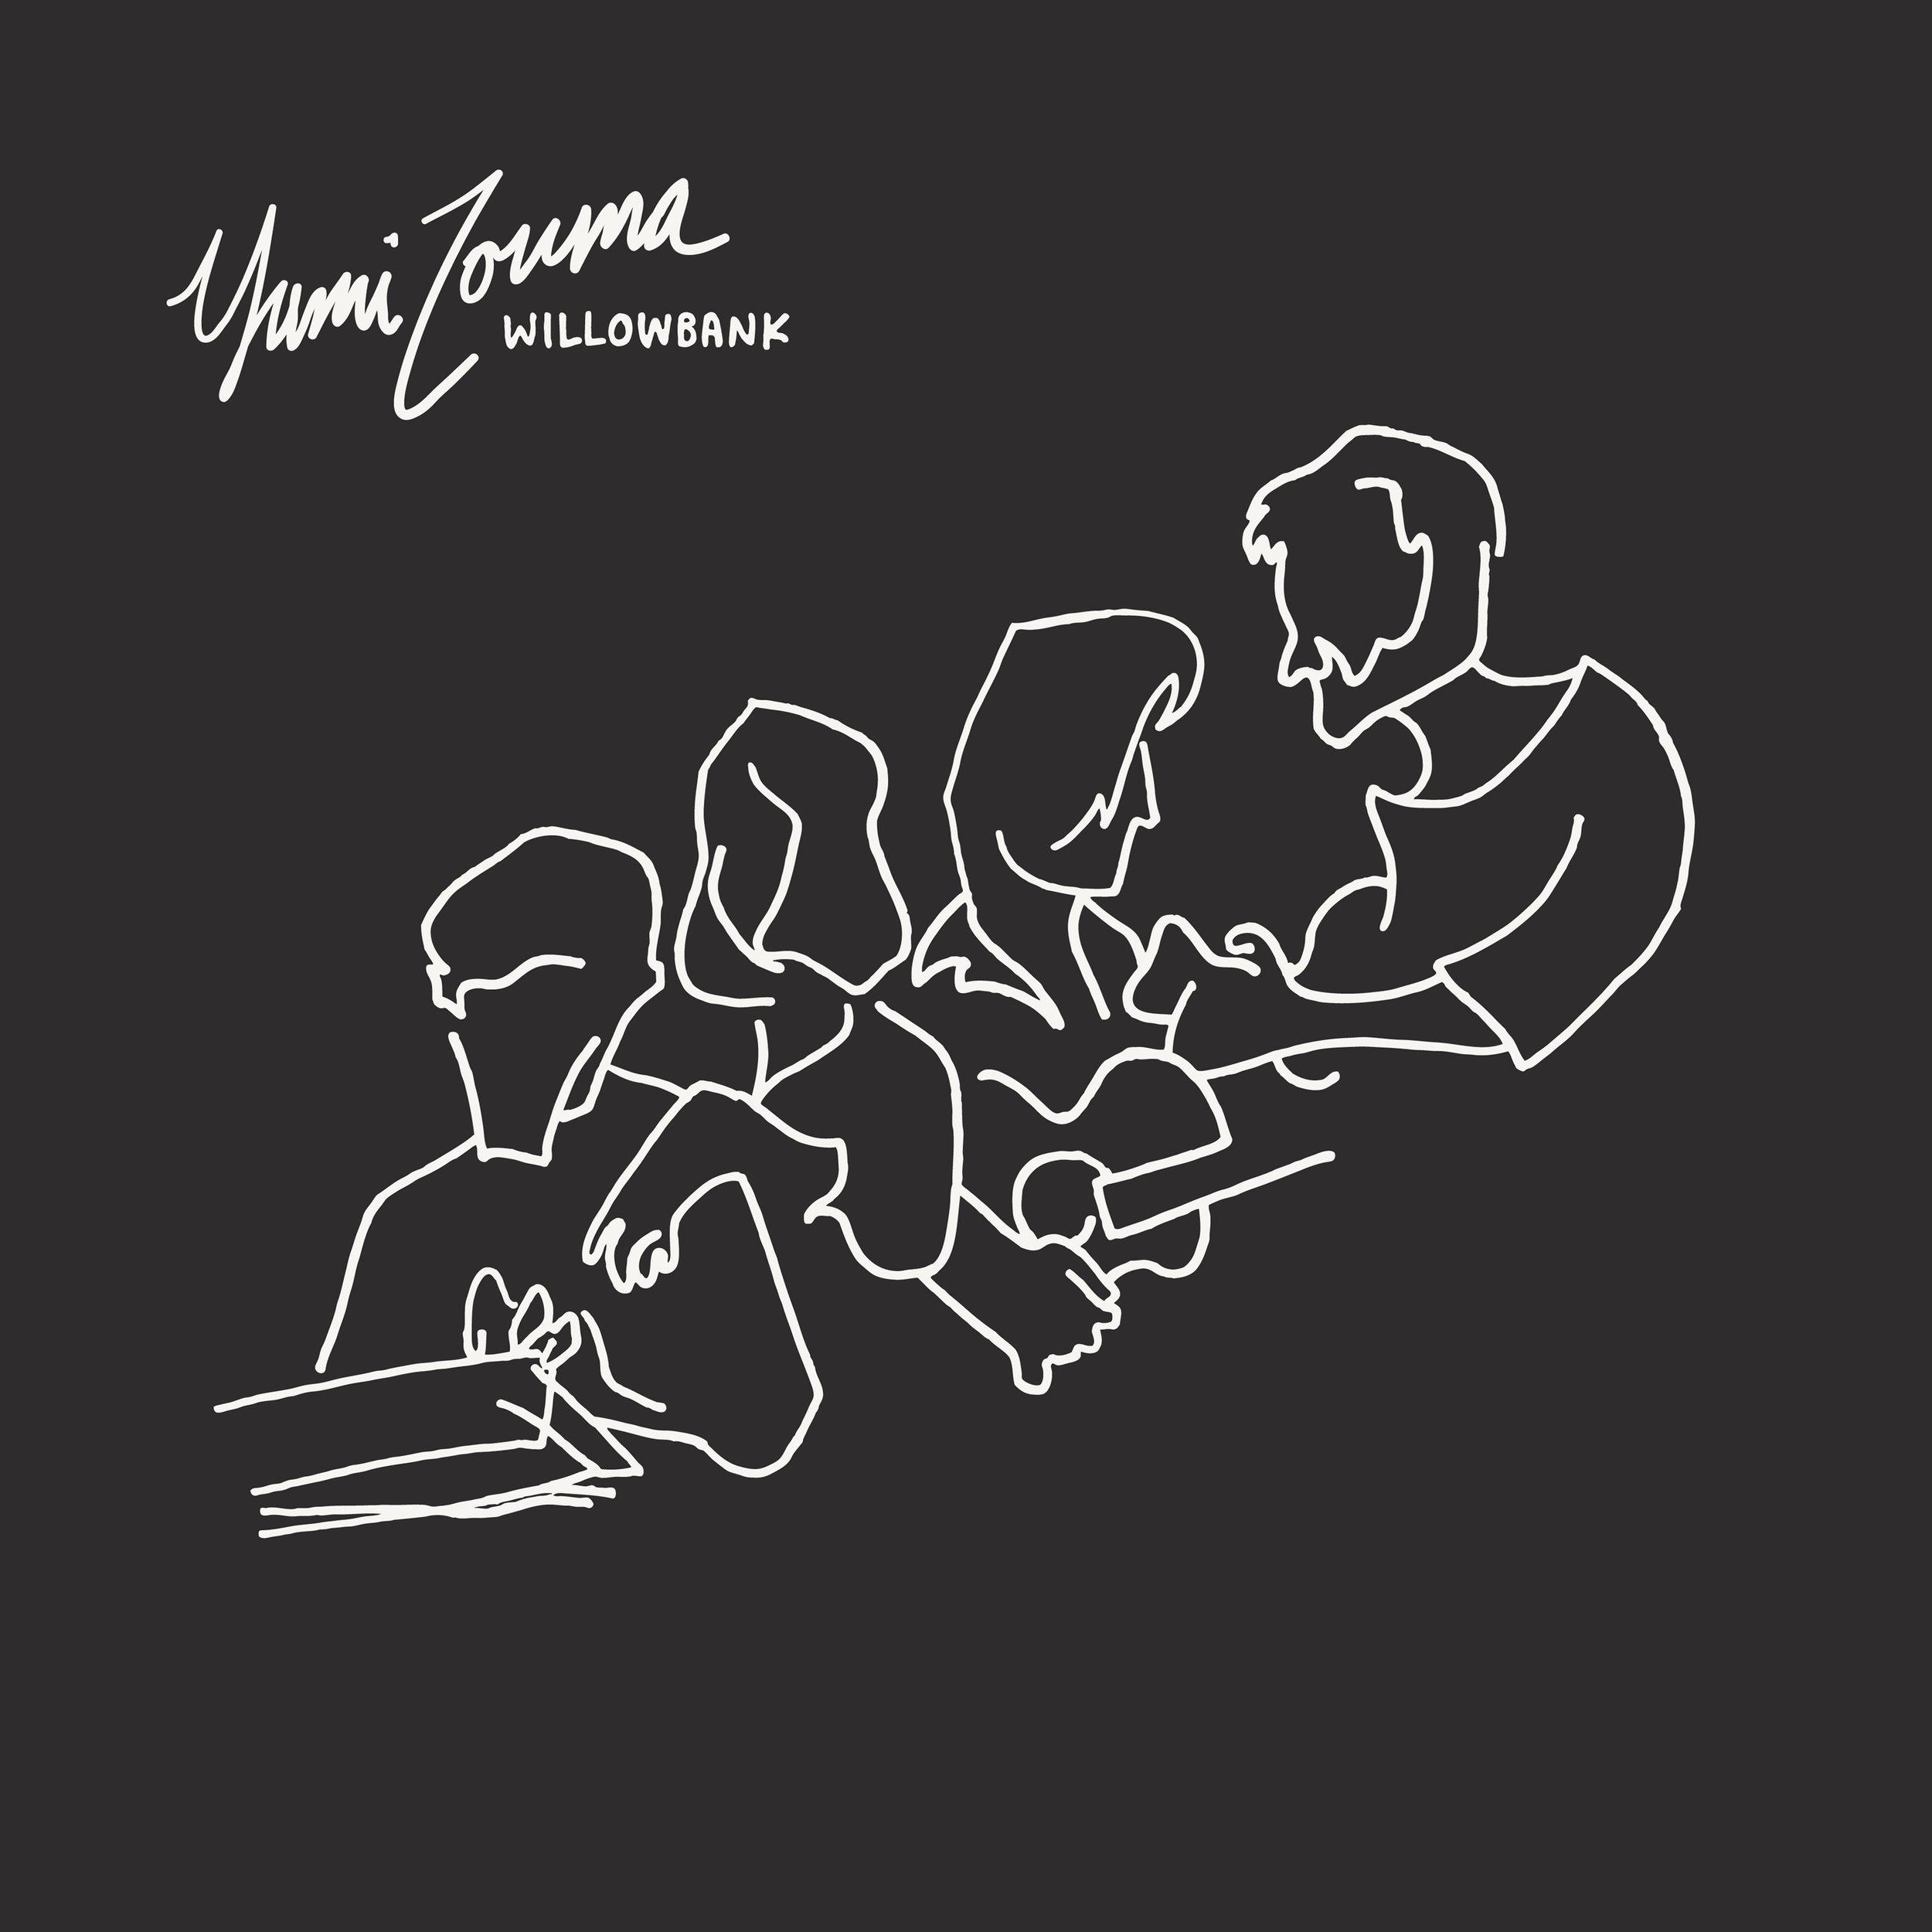 Yumi-Zouma-Willowbank-Cover-3000.jpg